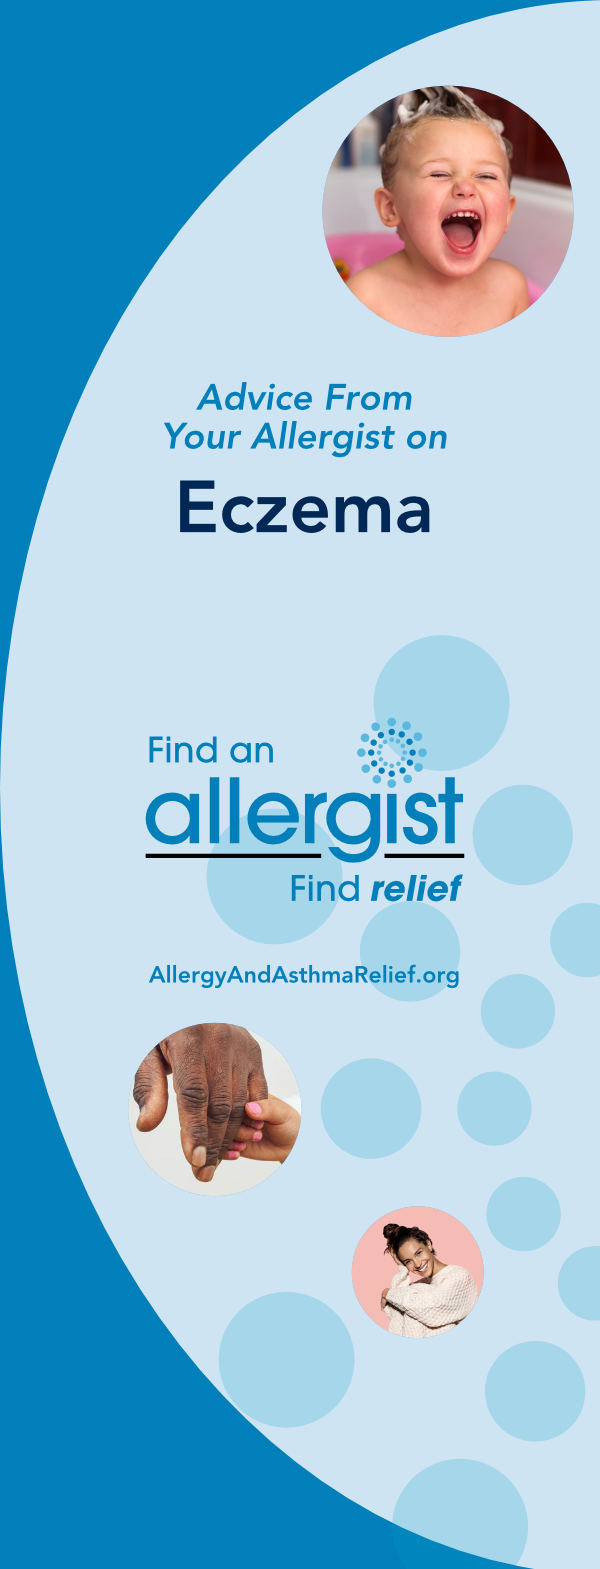 thumbnail cover of the ACAAI Eczema brochure